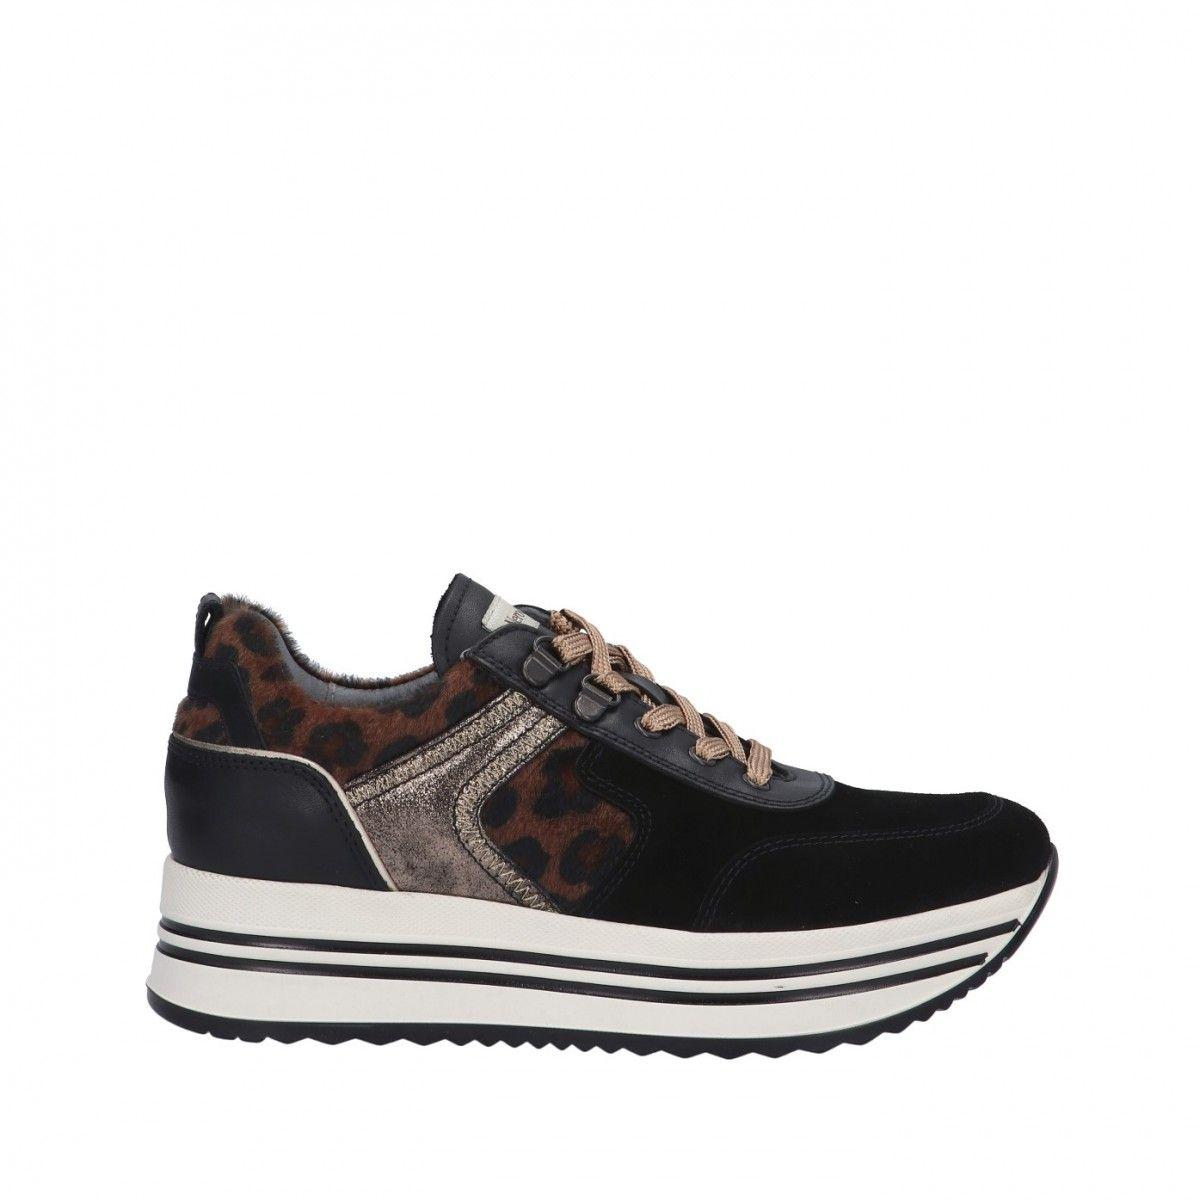 Nerogiardini Sneaker Nero...